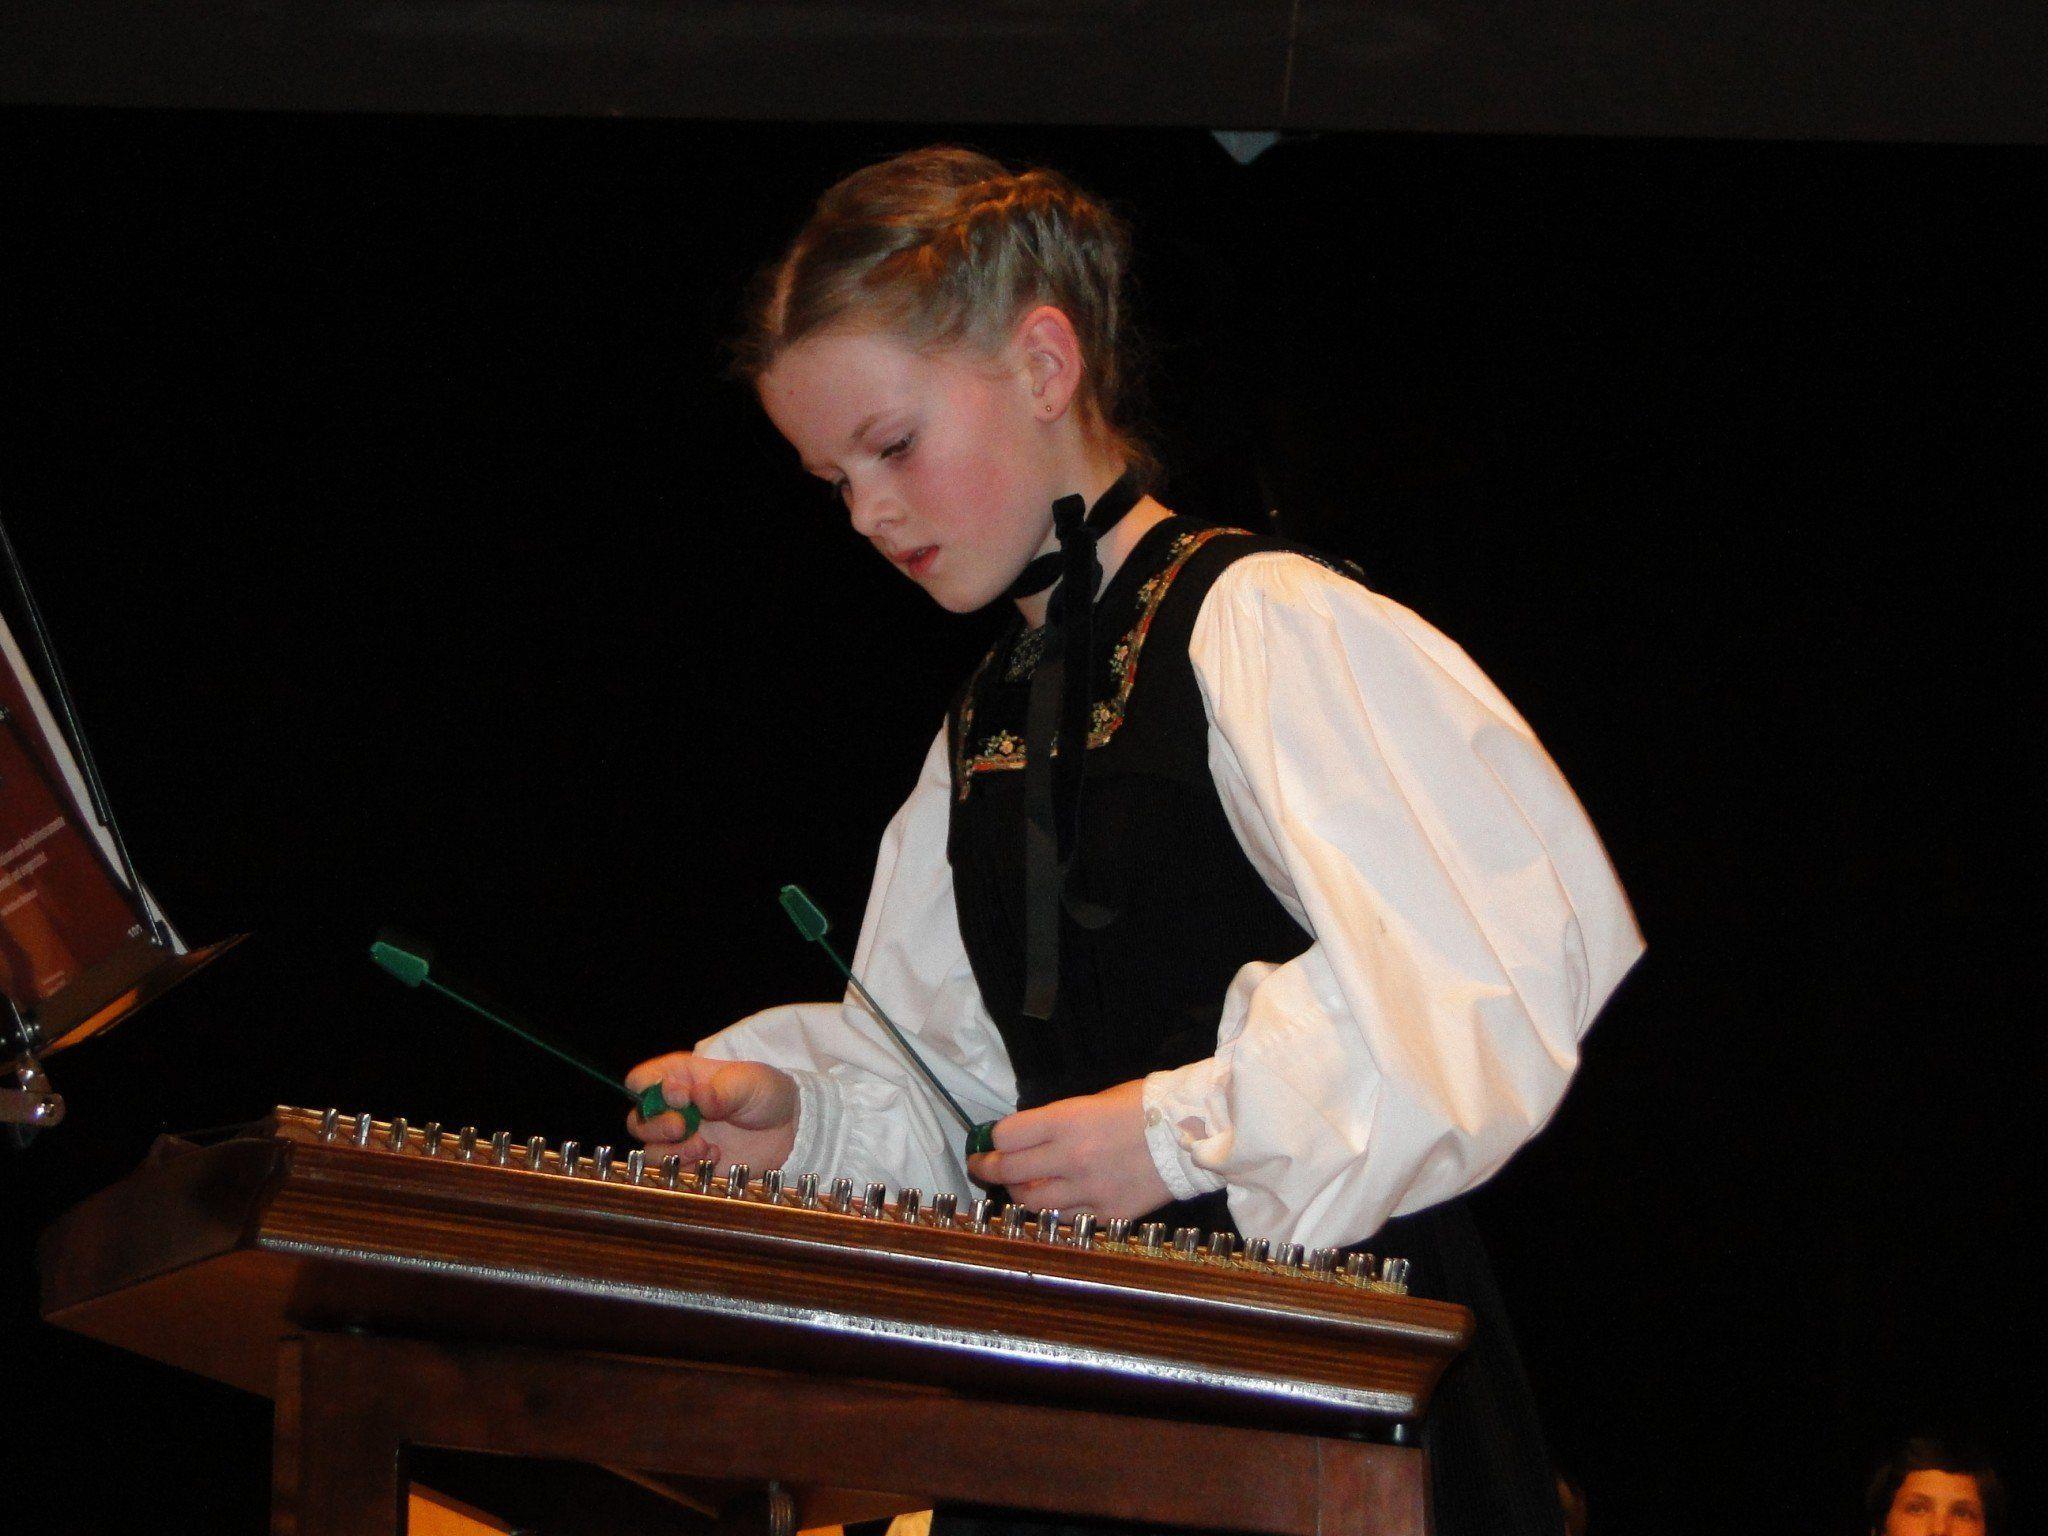 Hingebungsvoll musizierten SchülerInnen des Musikschule Bregenzerwald